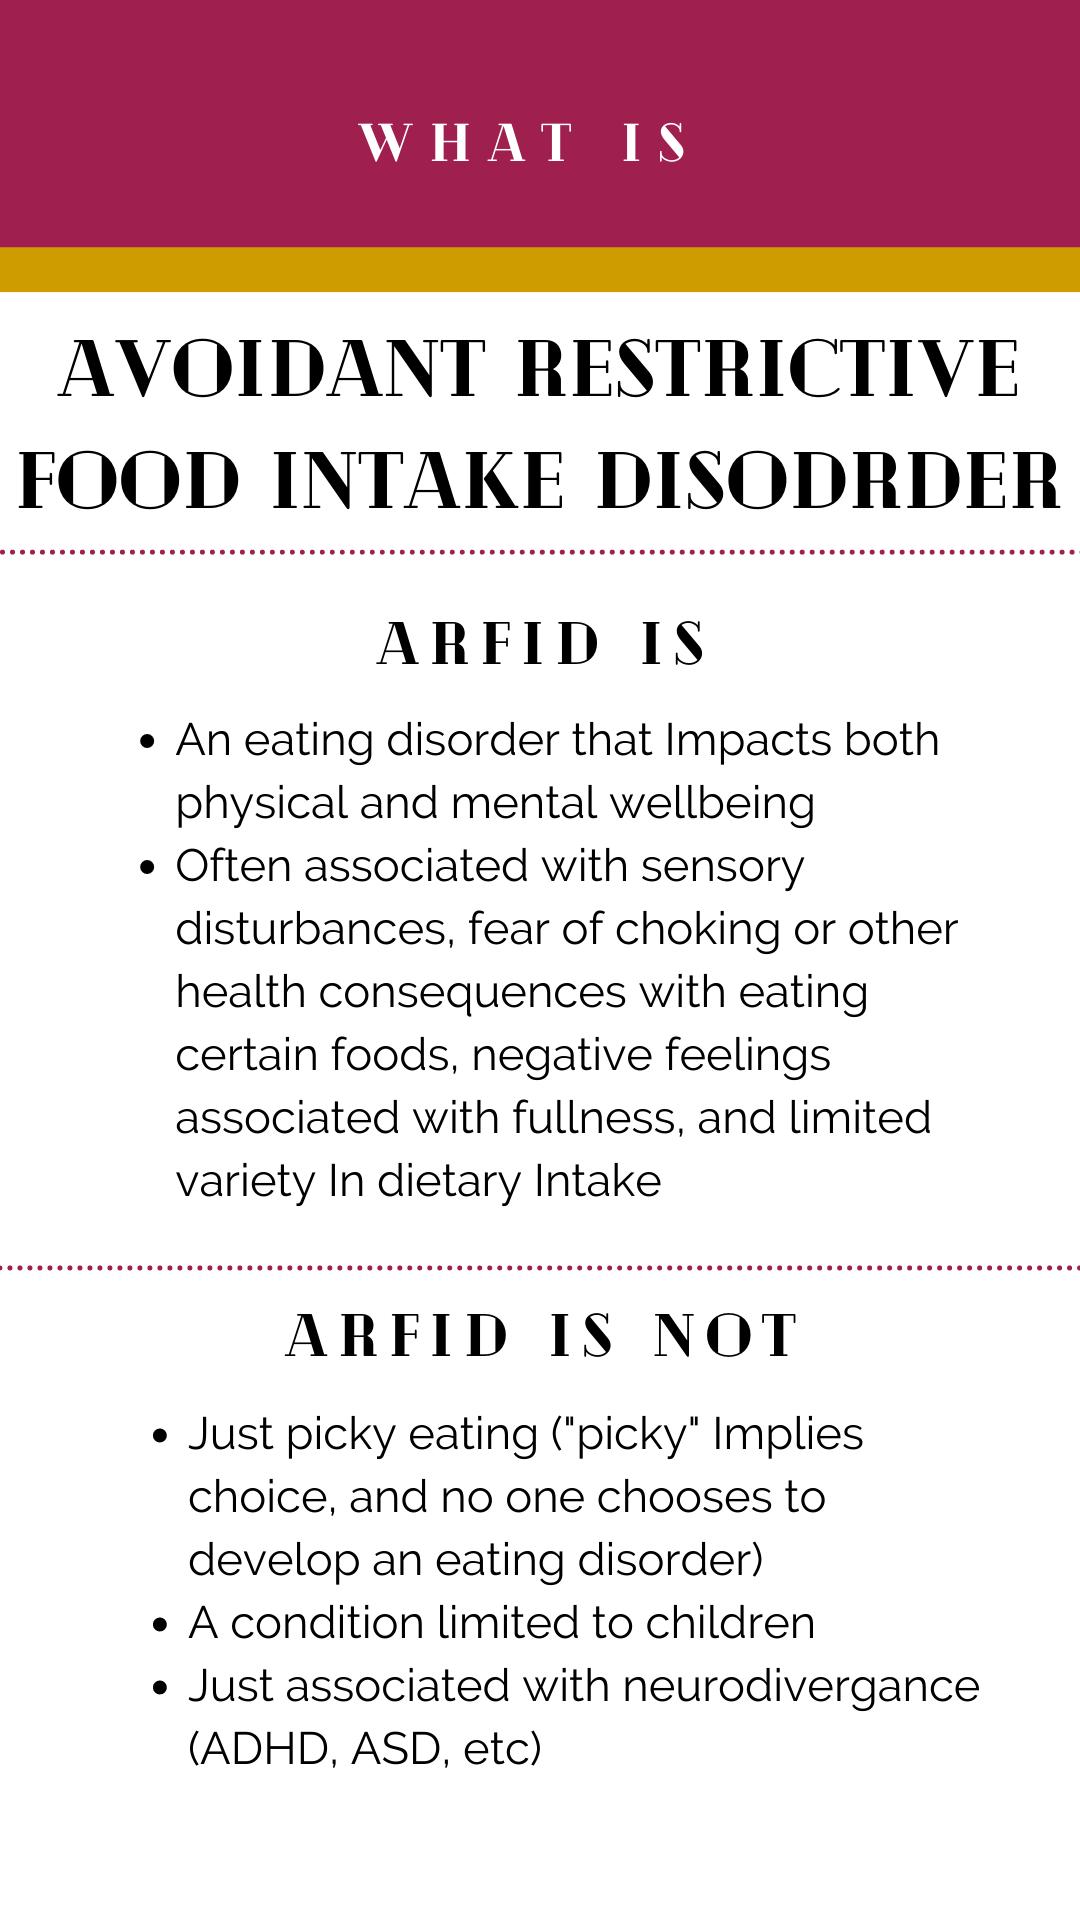 AFRID Infographic